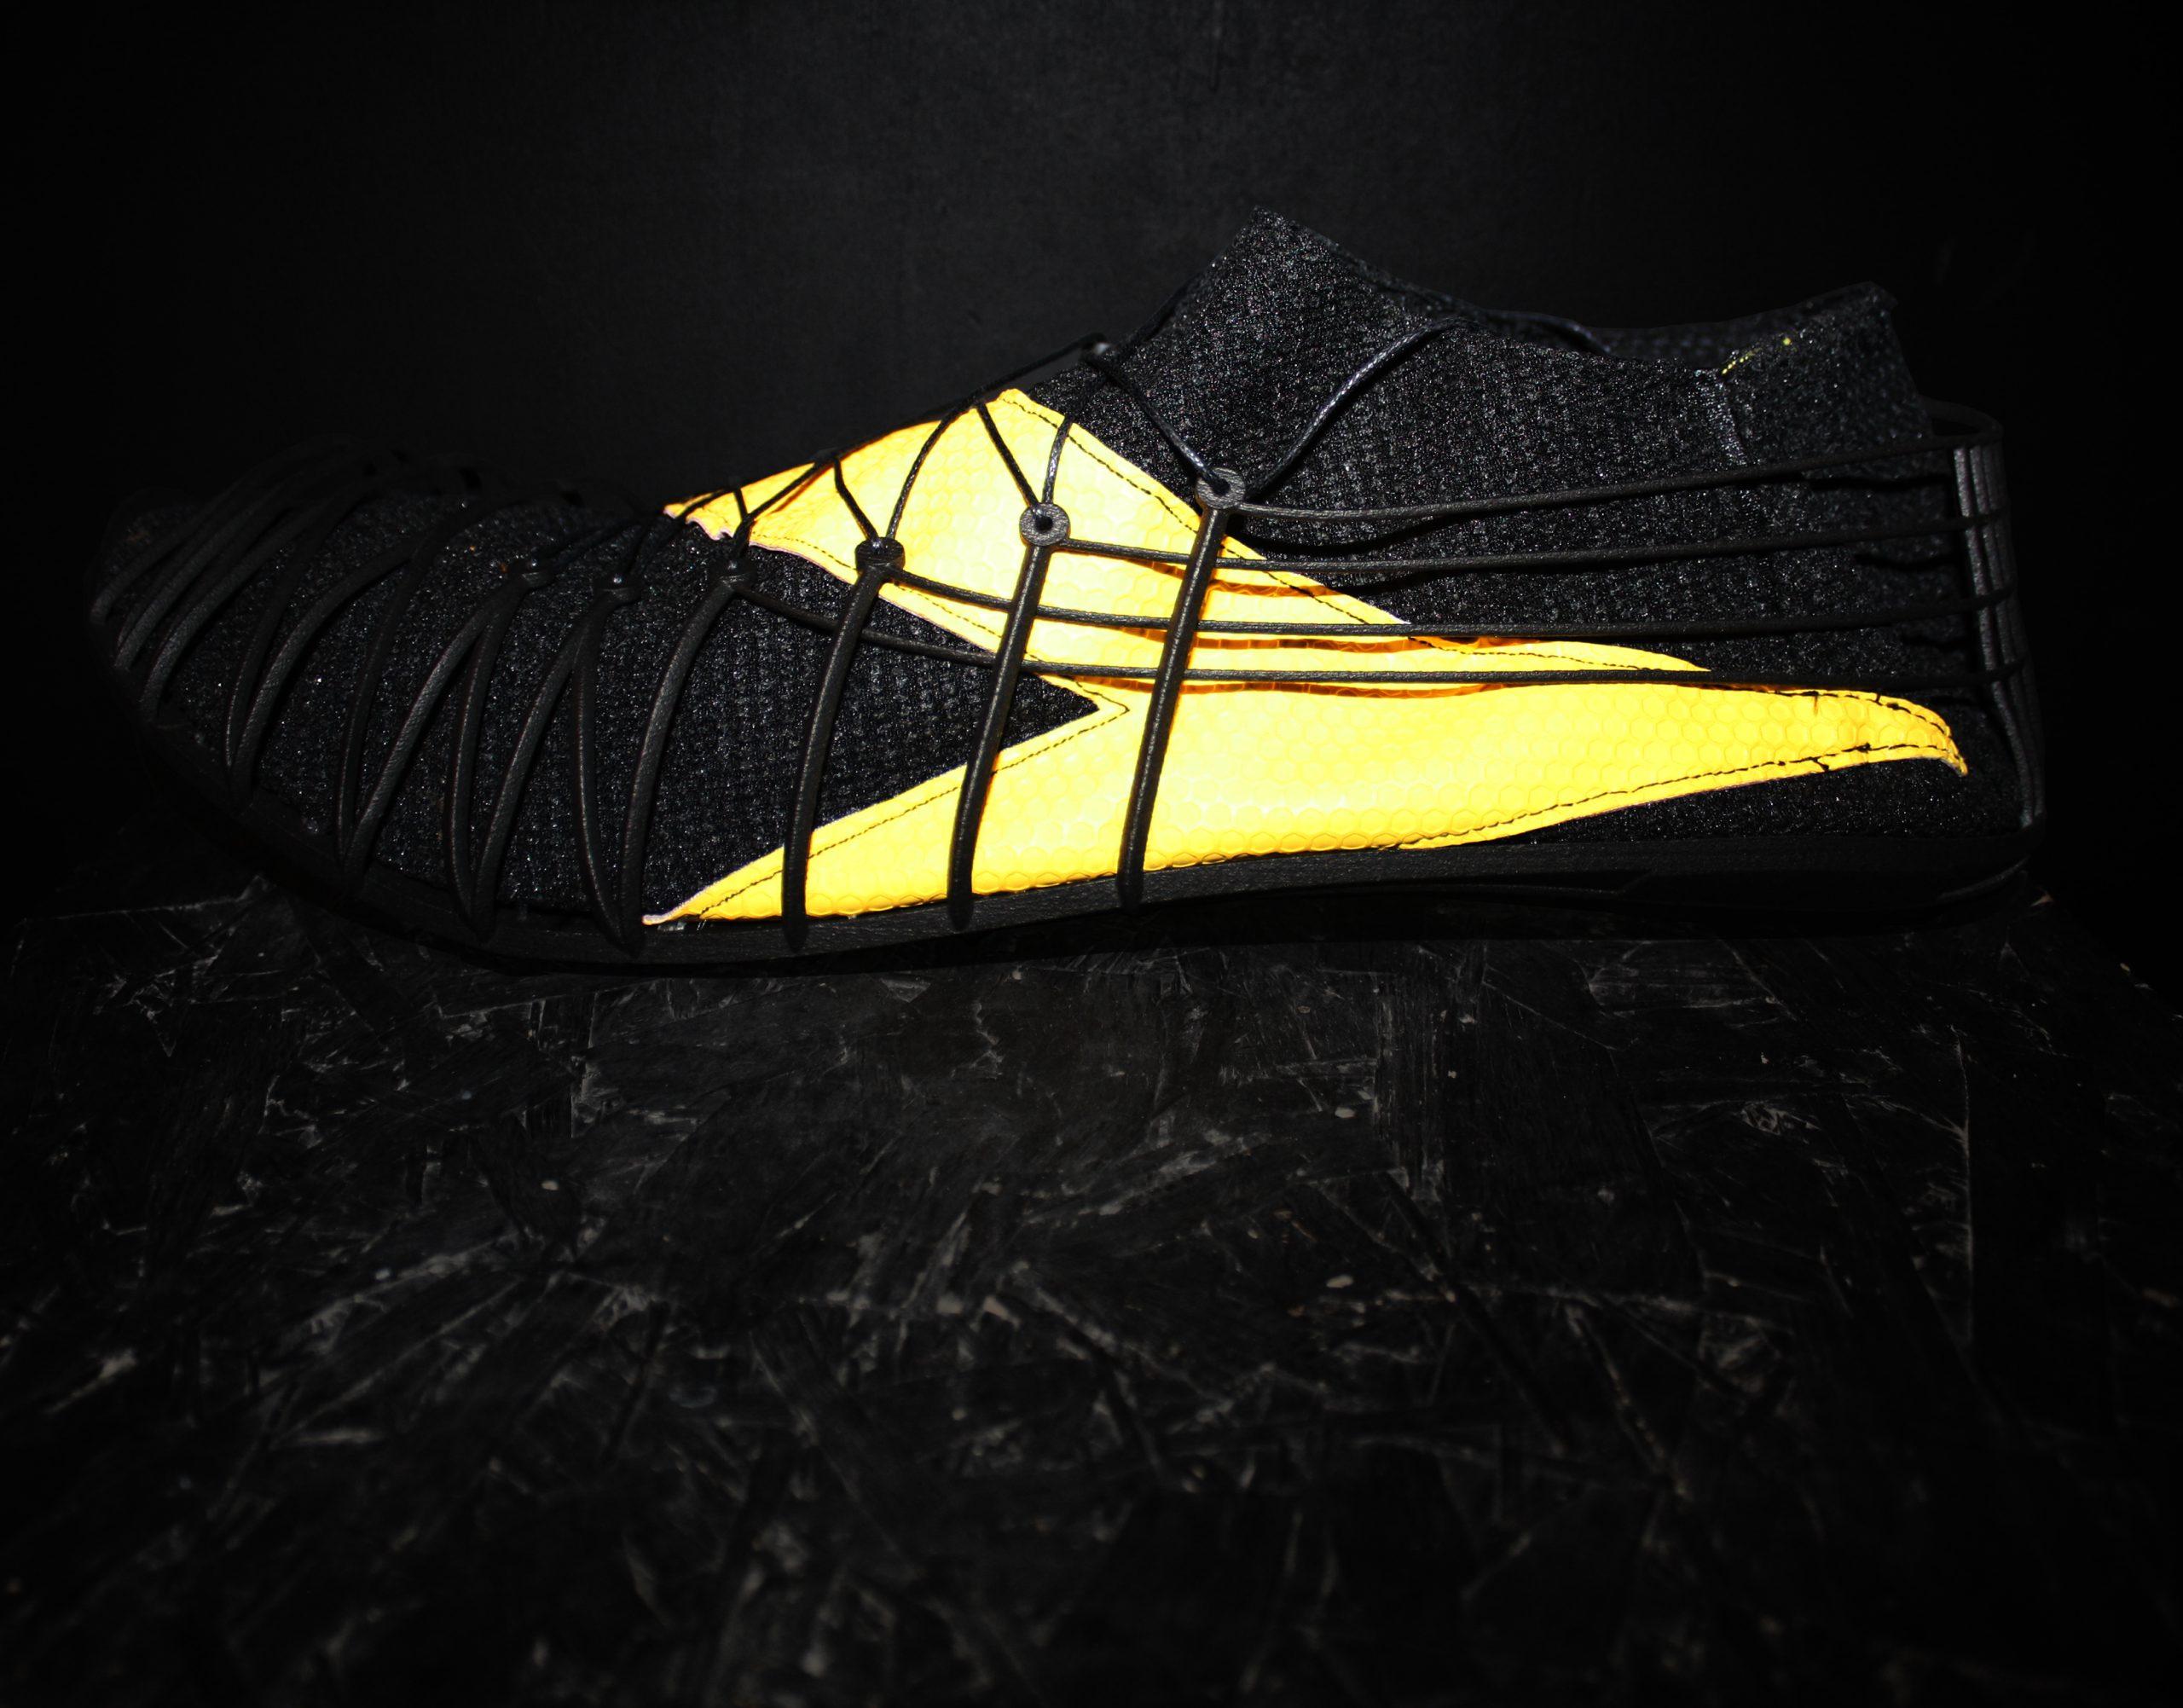 The Pleko spike shoe prototype. Photo via CRP Technology.